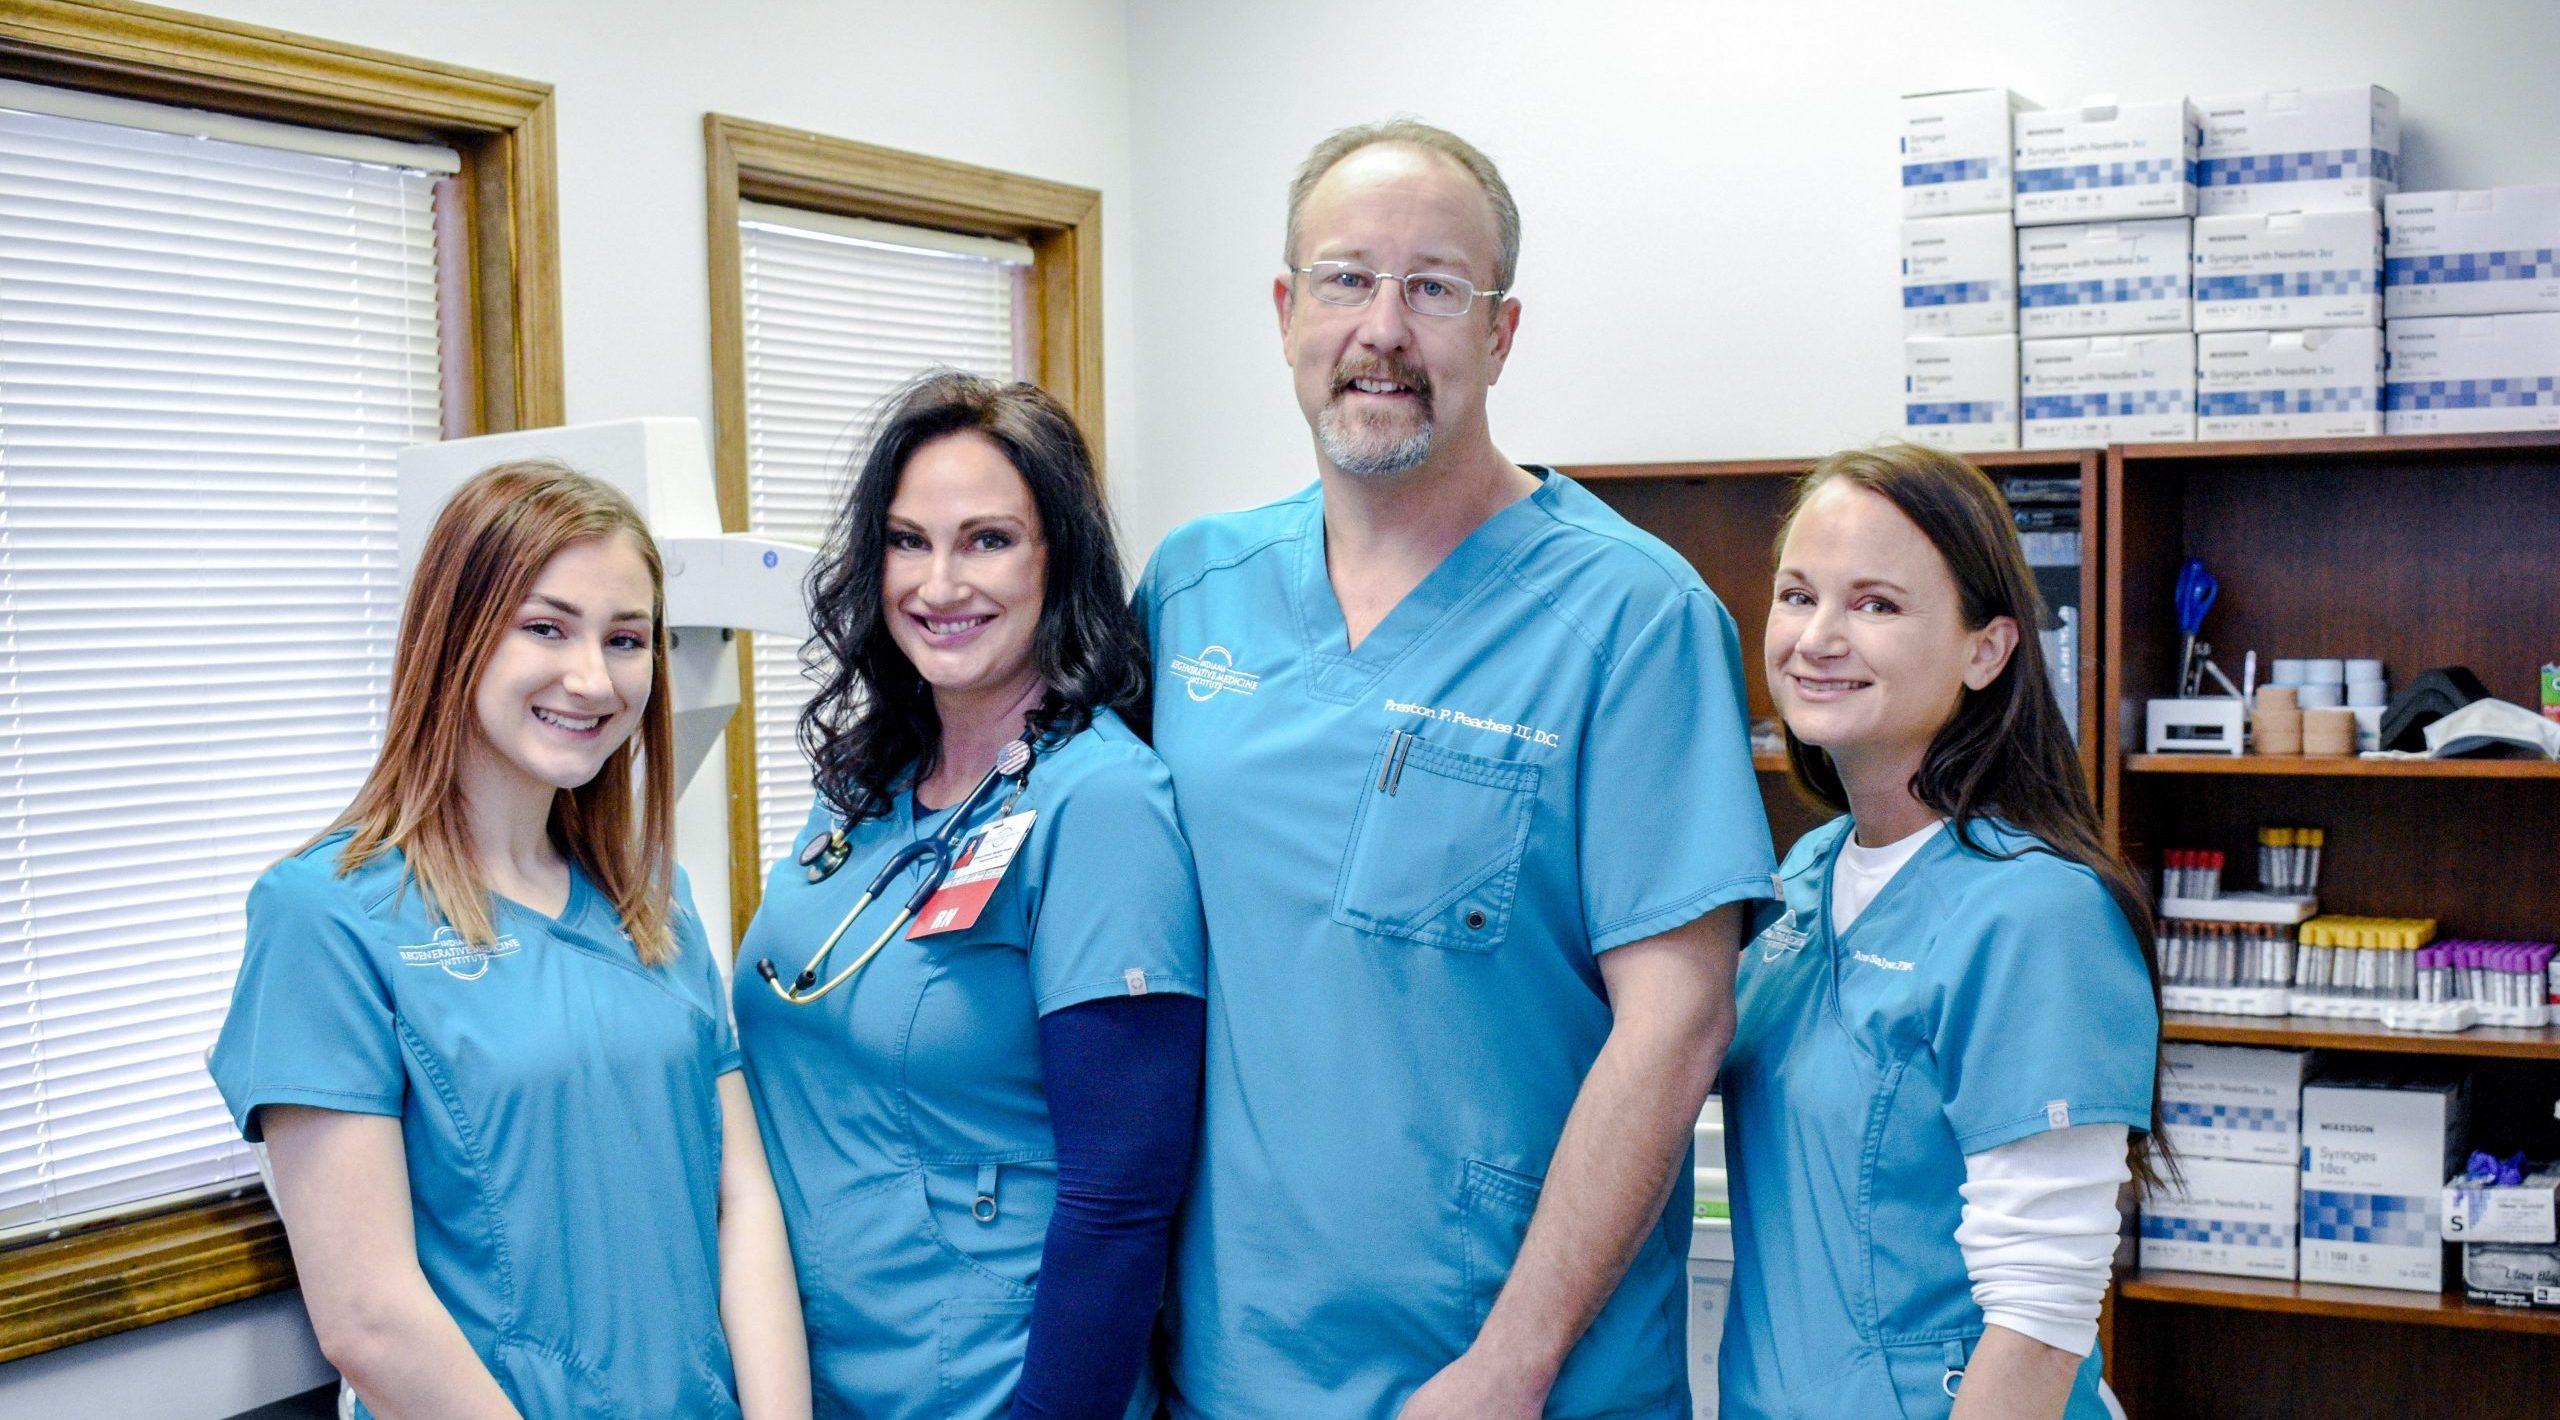 Indiana Regenerative Medicine Welcomes